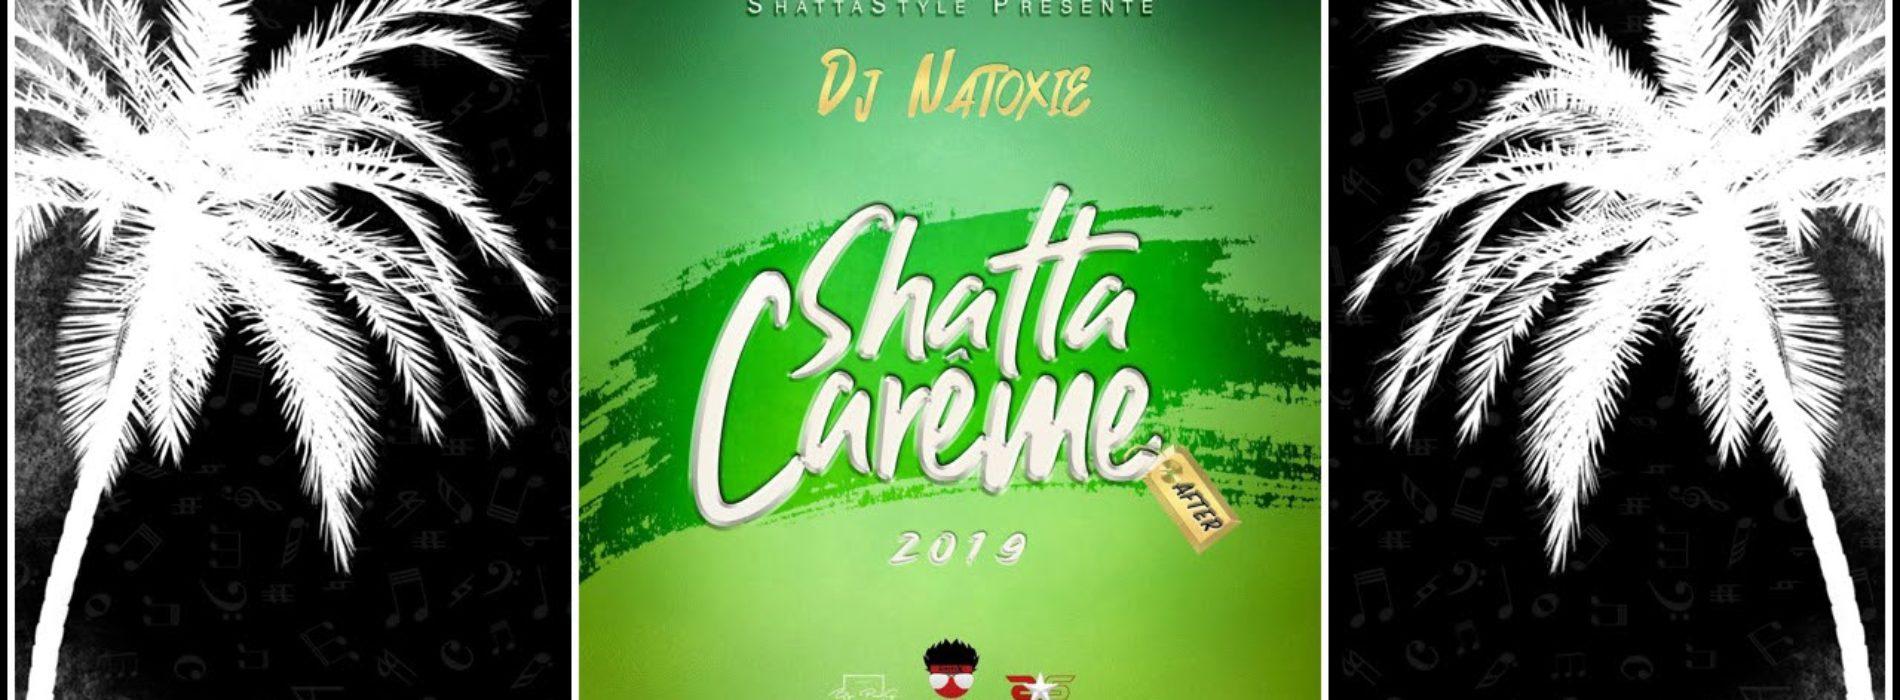 DJ NATOXIE – SHATTA CAREME (AFTER) 2019 / DJ TOM – 🕉️LA DEFONCE TOTAL VOL.1🕉️ – Avril 2019